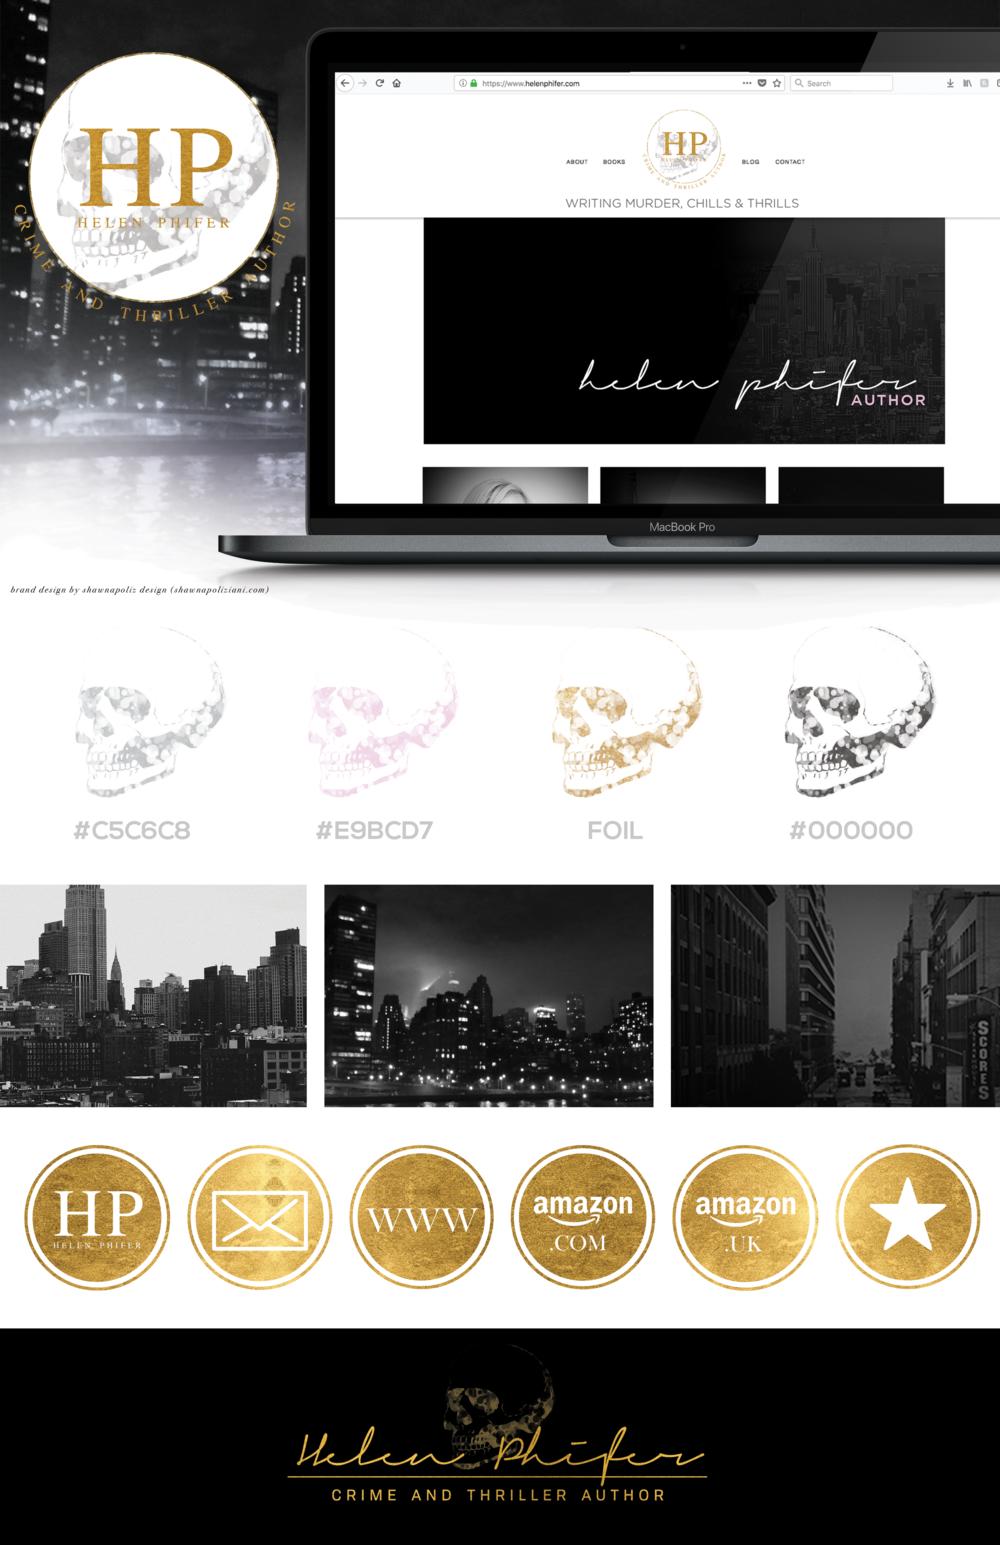 Helen Phifer Brand Board.png